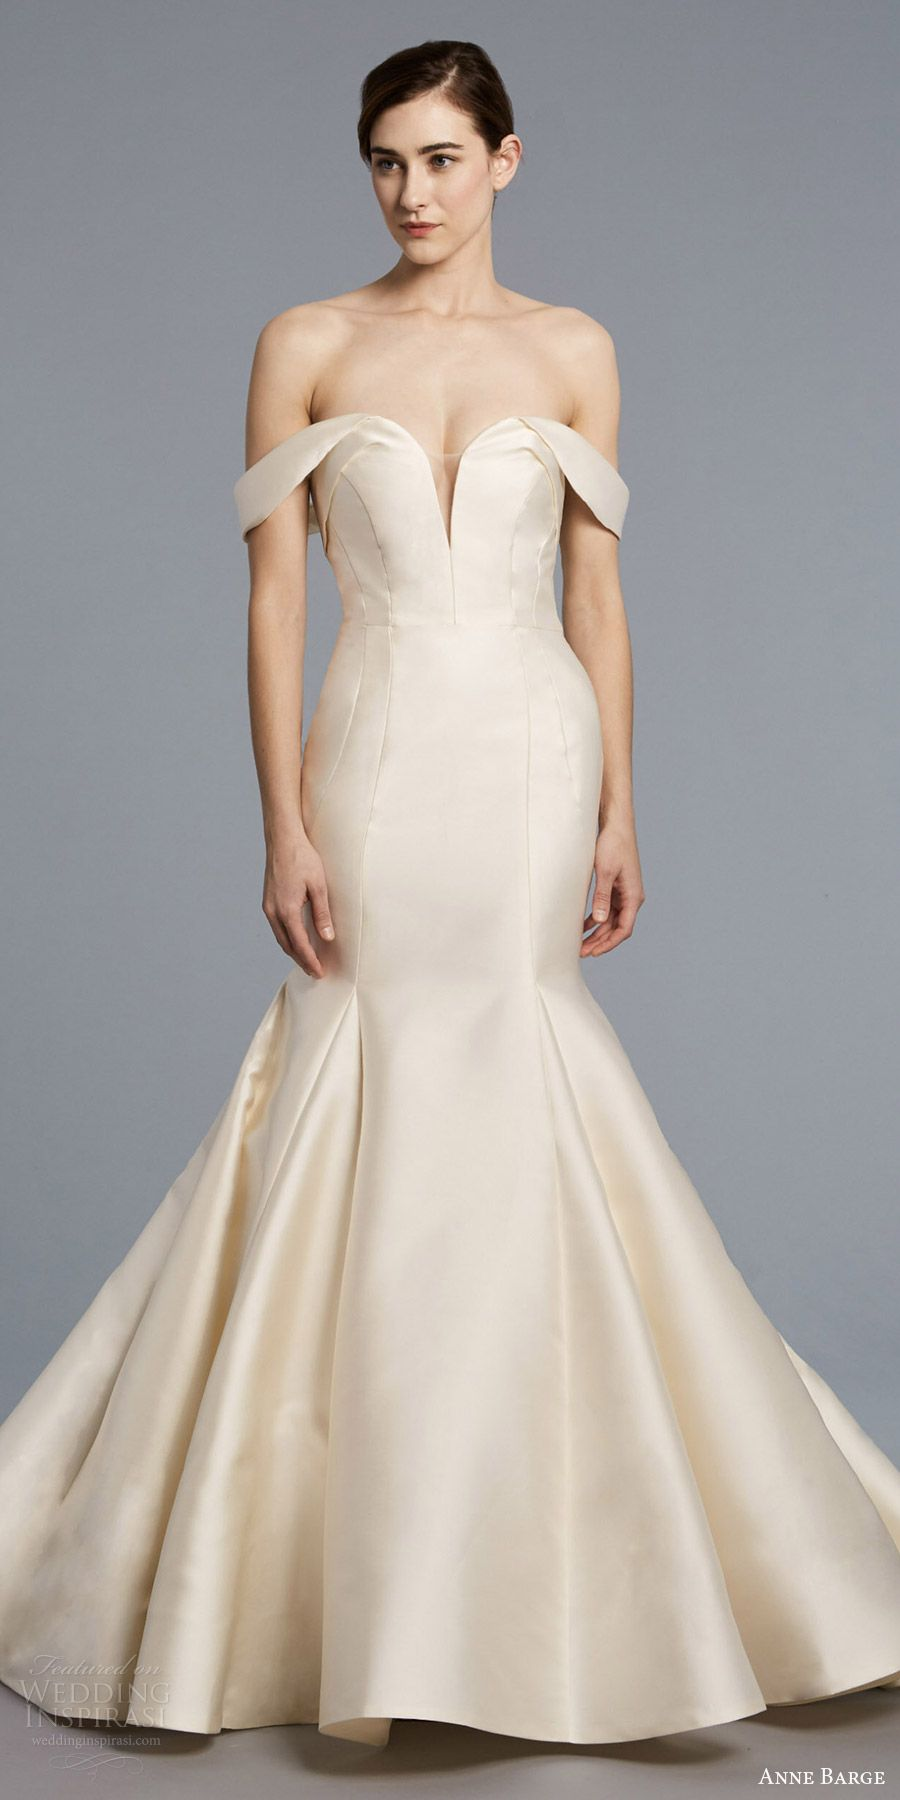 Anne Barge Spring 2018 Wedding Dresses — New York Bridal Fashion ...